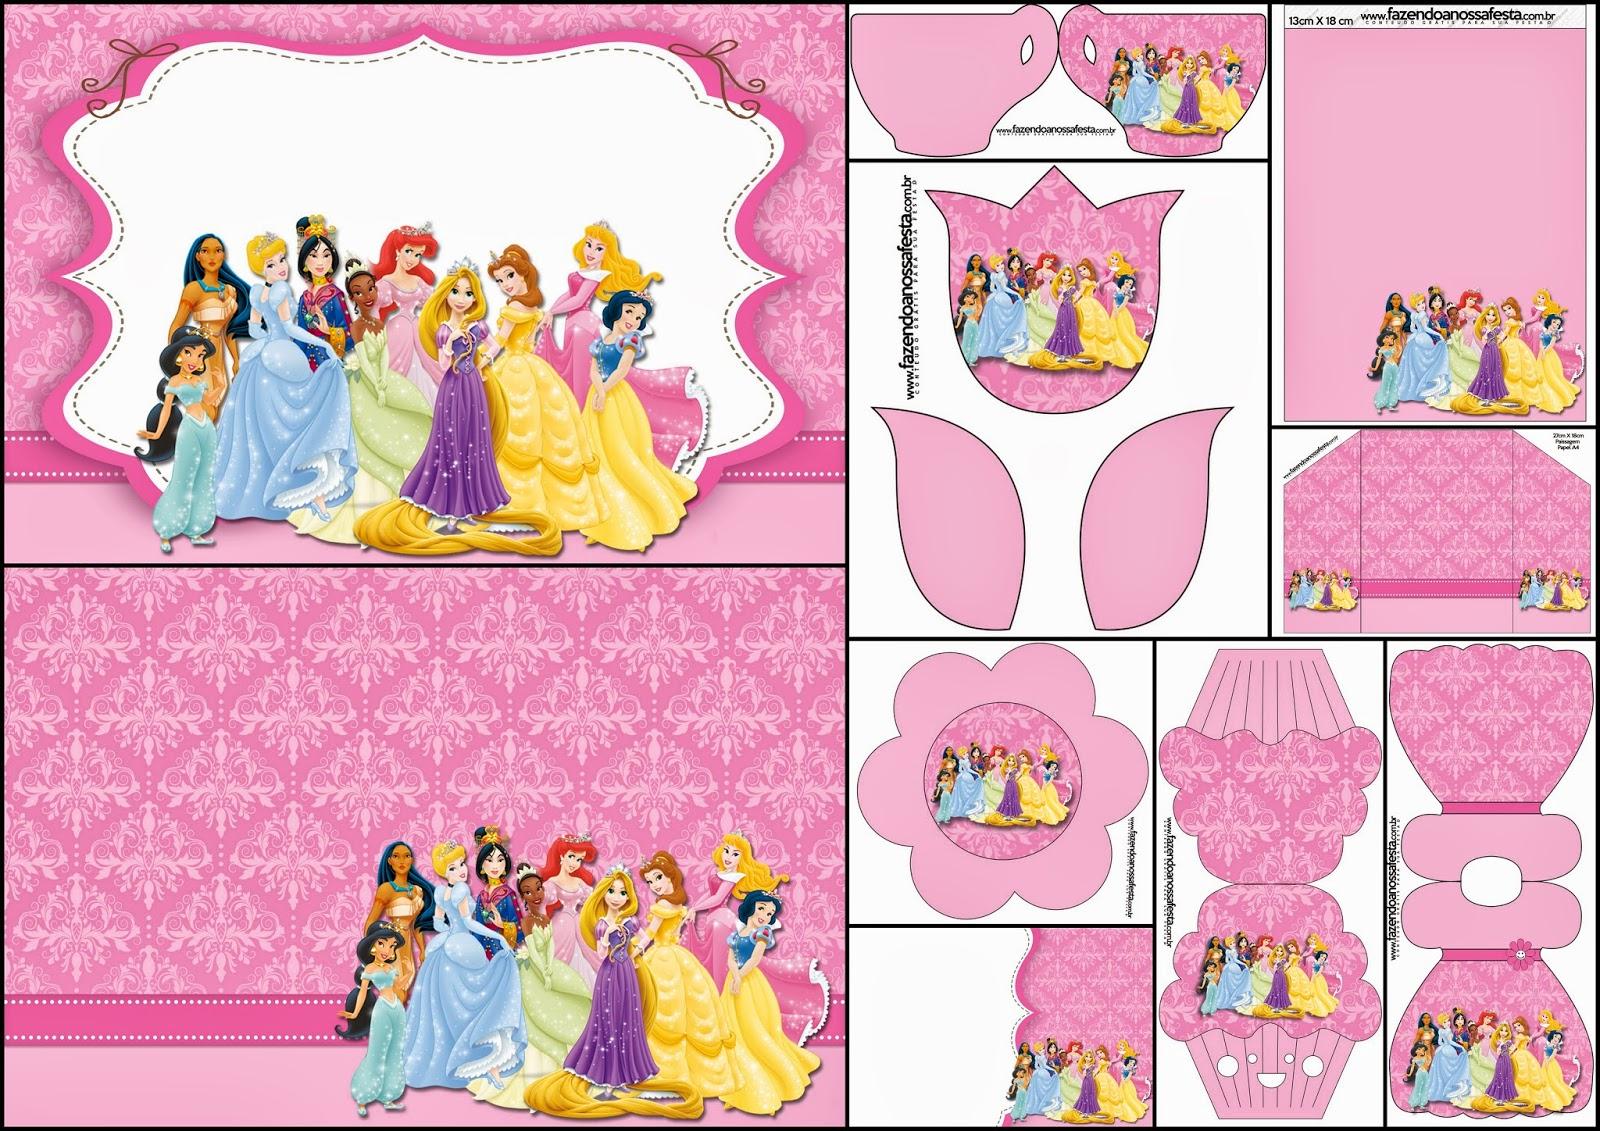 Disney Princess Party: Free Printable Party Invitations. | Oh My - Disney Princess Free Printable Invitations